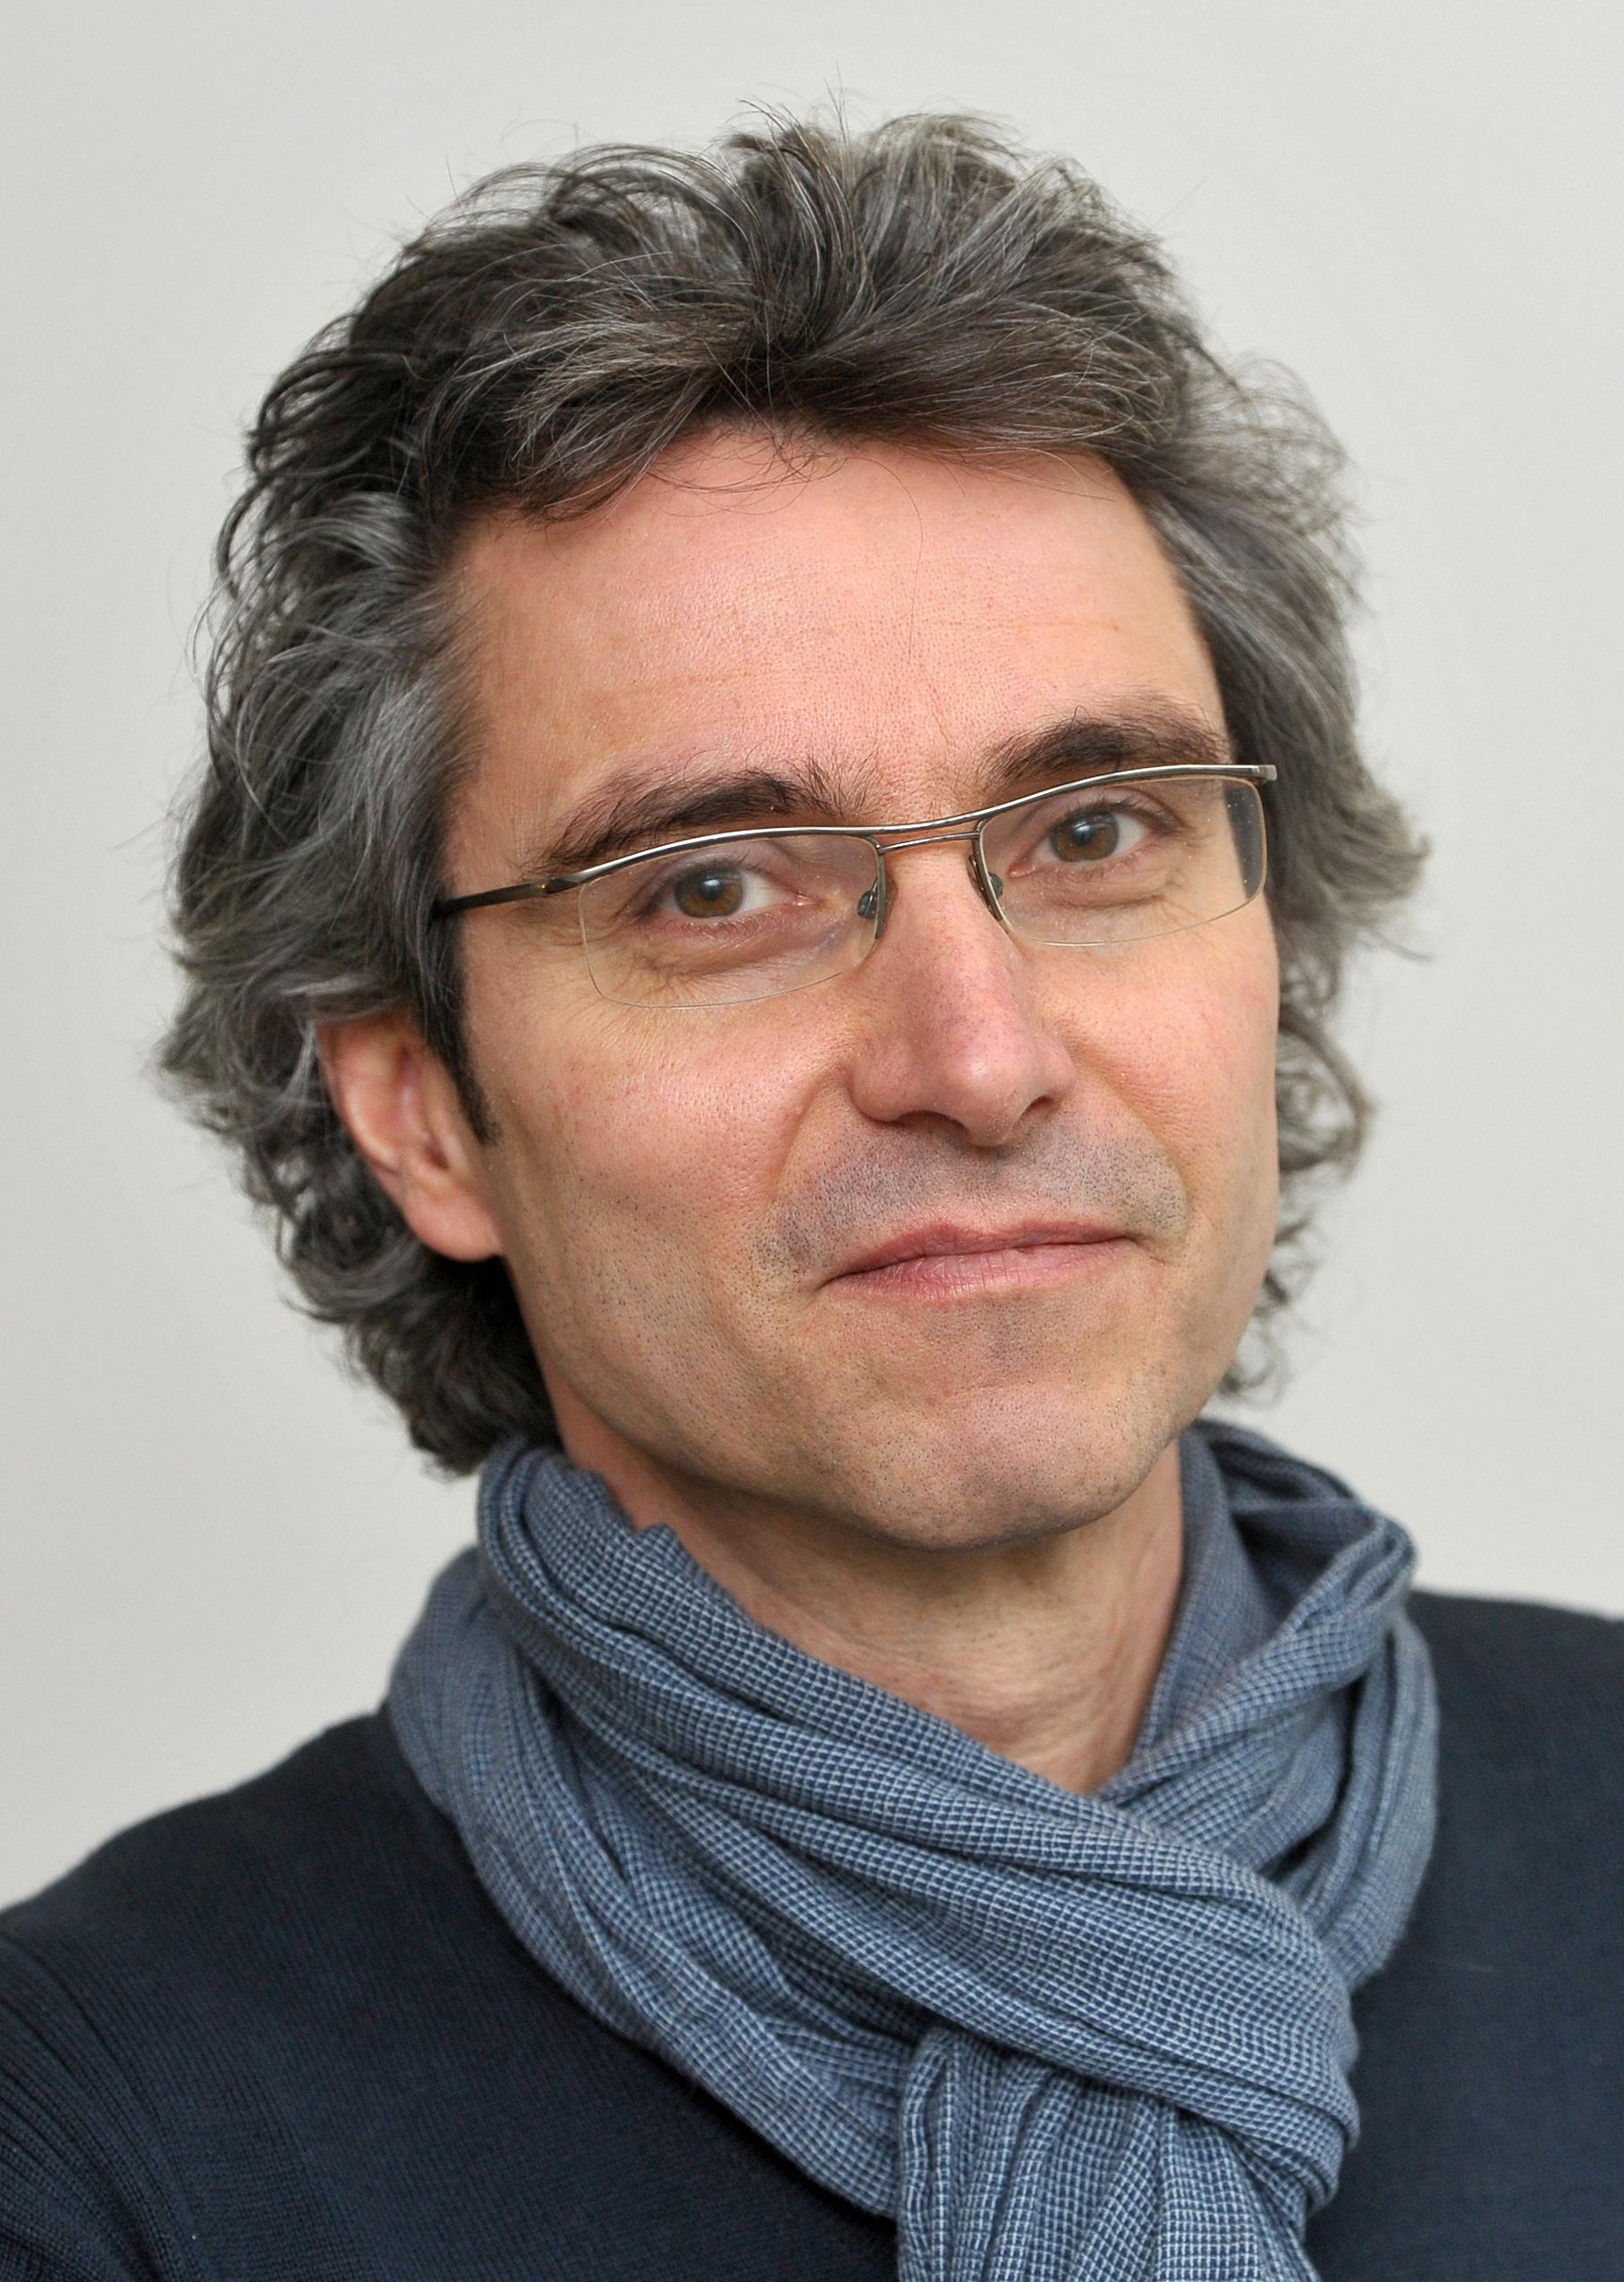 Portraet Kommentar - Leitartikel - Standpunkt - Redakteur Kultur Mark DanielFoto: Andreas Döring (Doering)